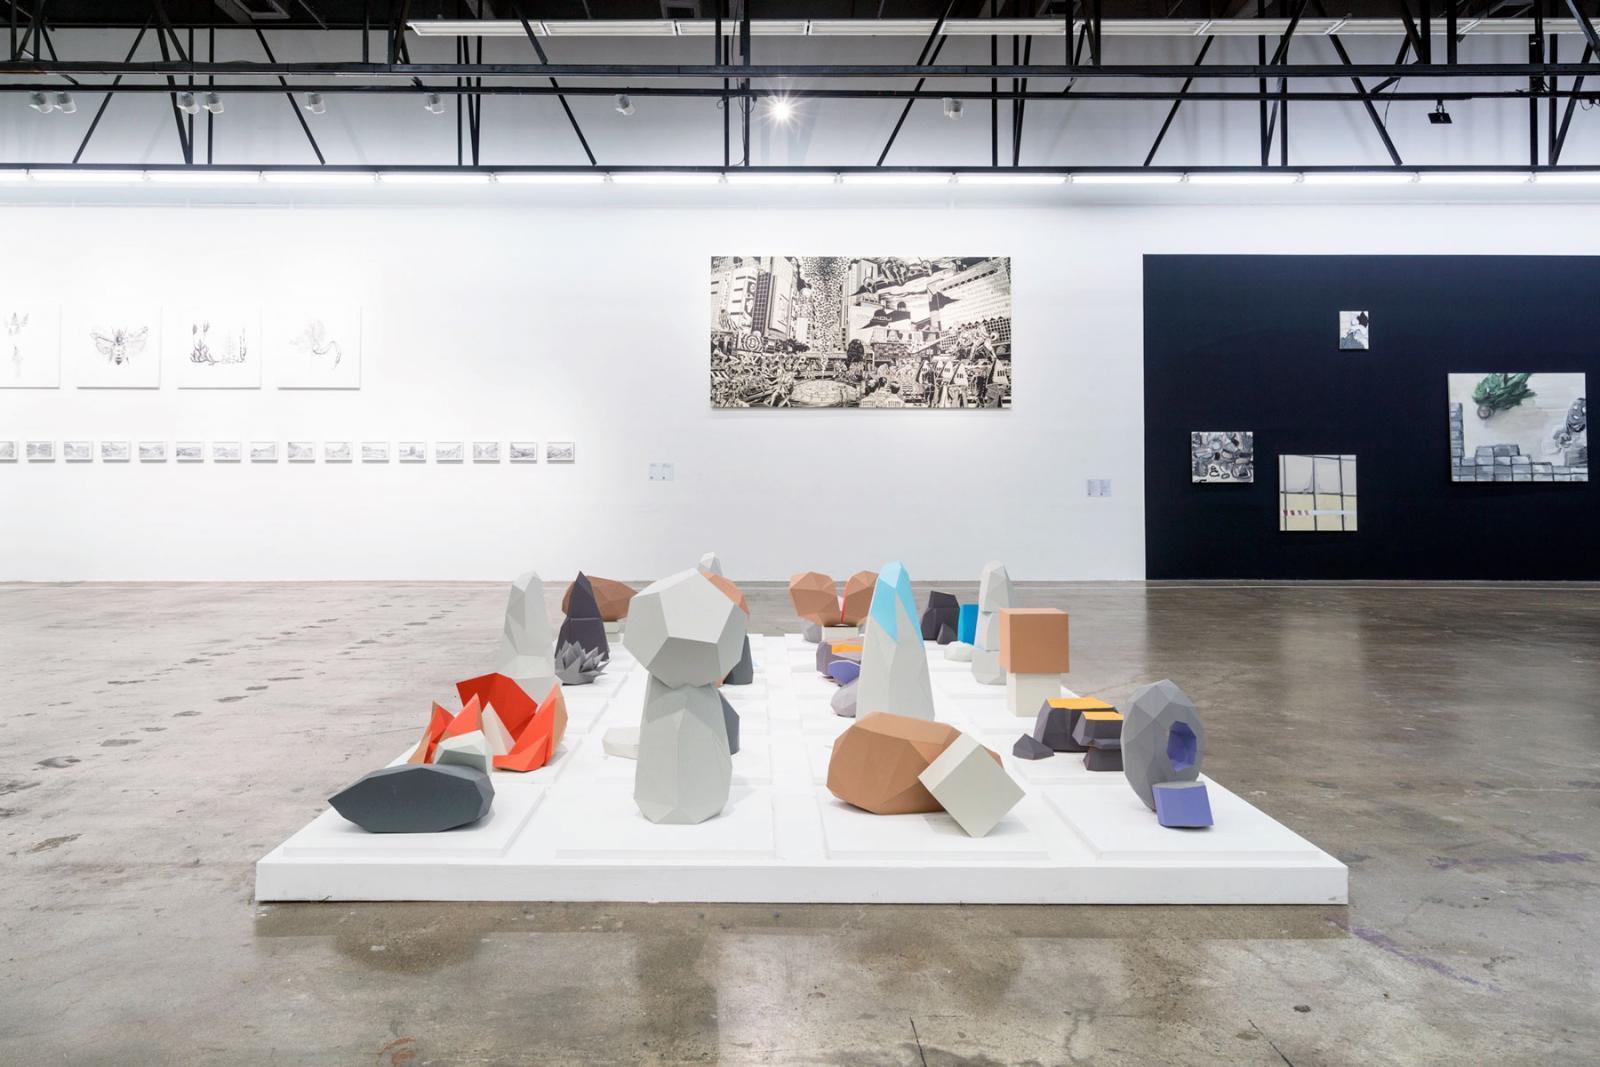 Tommy Støckel /The Gwangju Rocks/, 2016